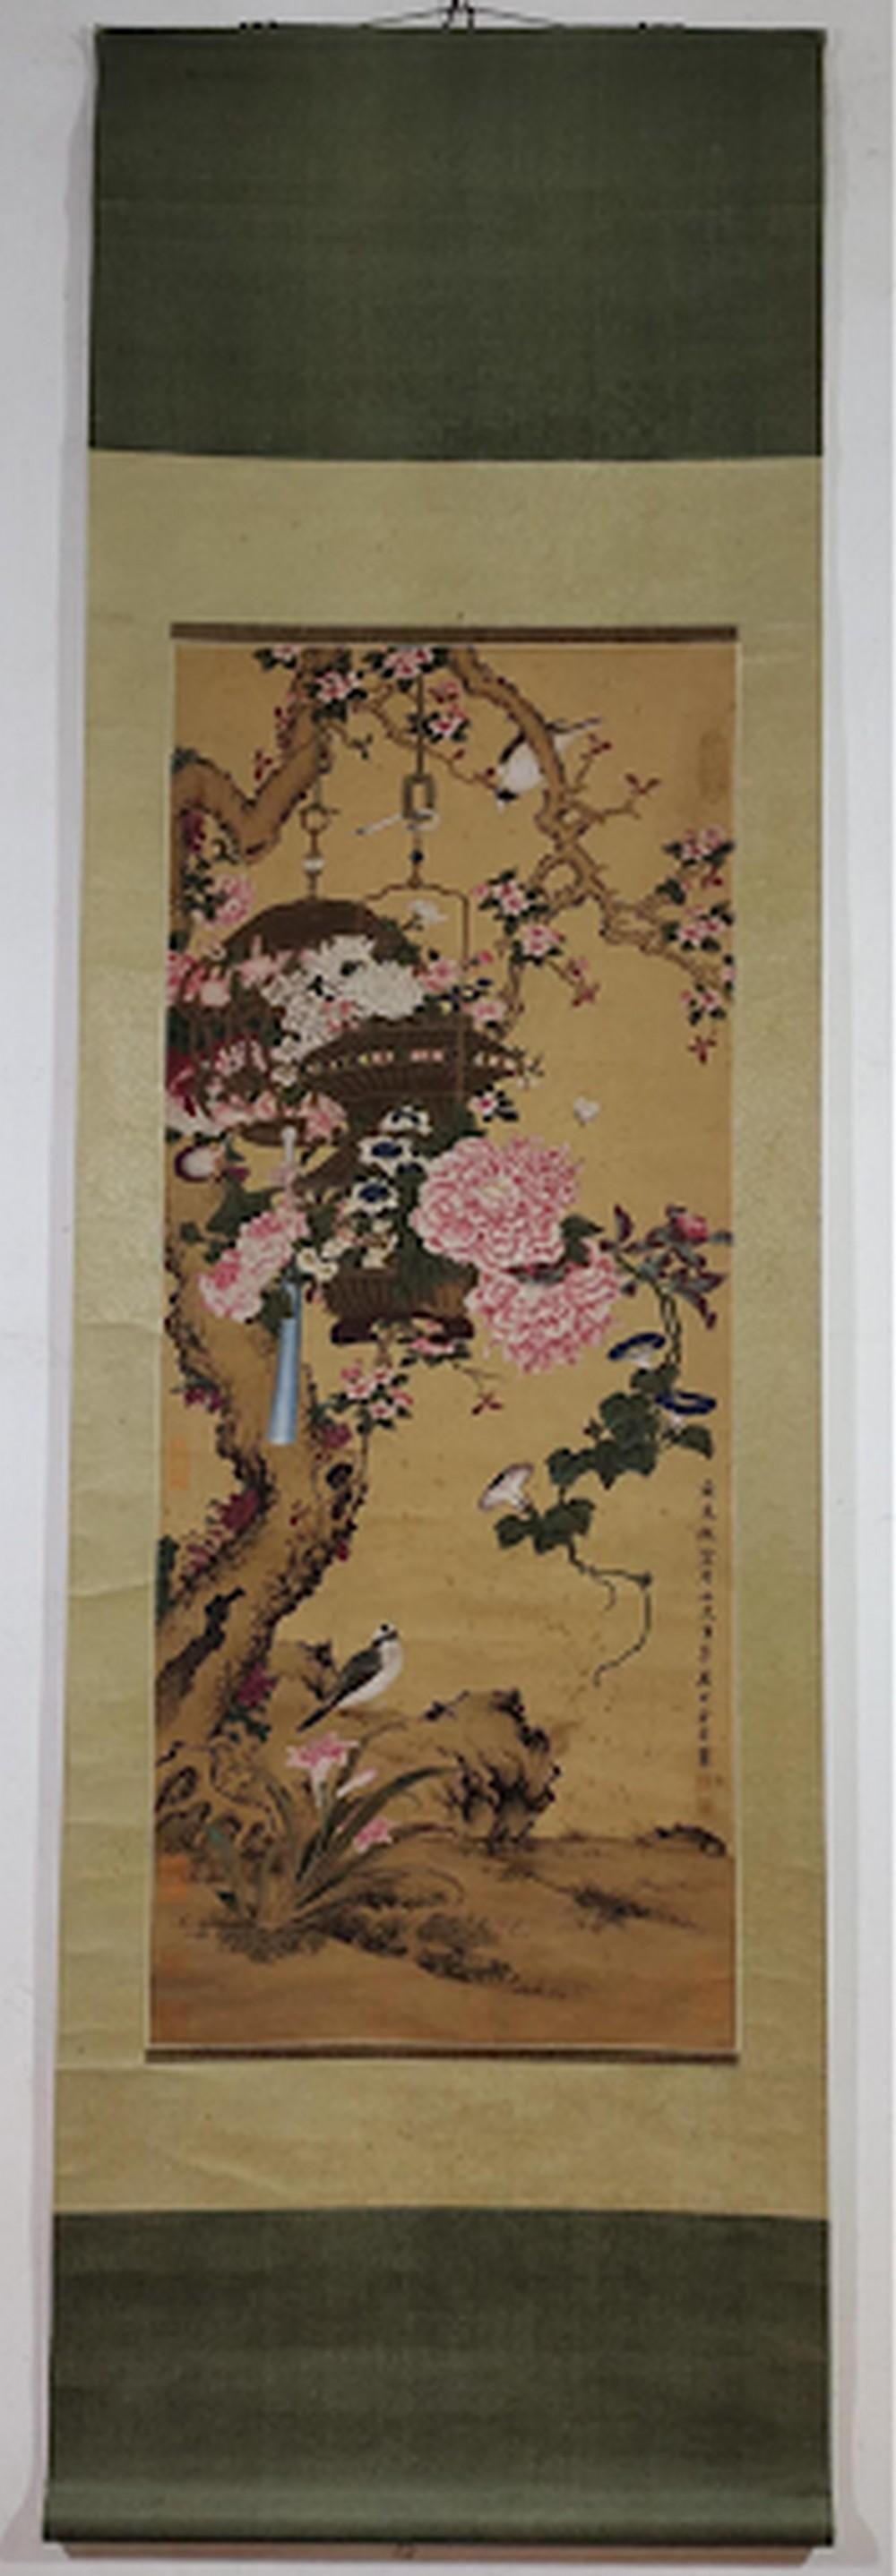 Birds & Flowers Silk Scroll by Yu Xing